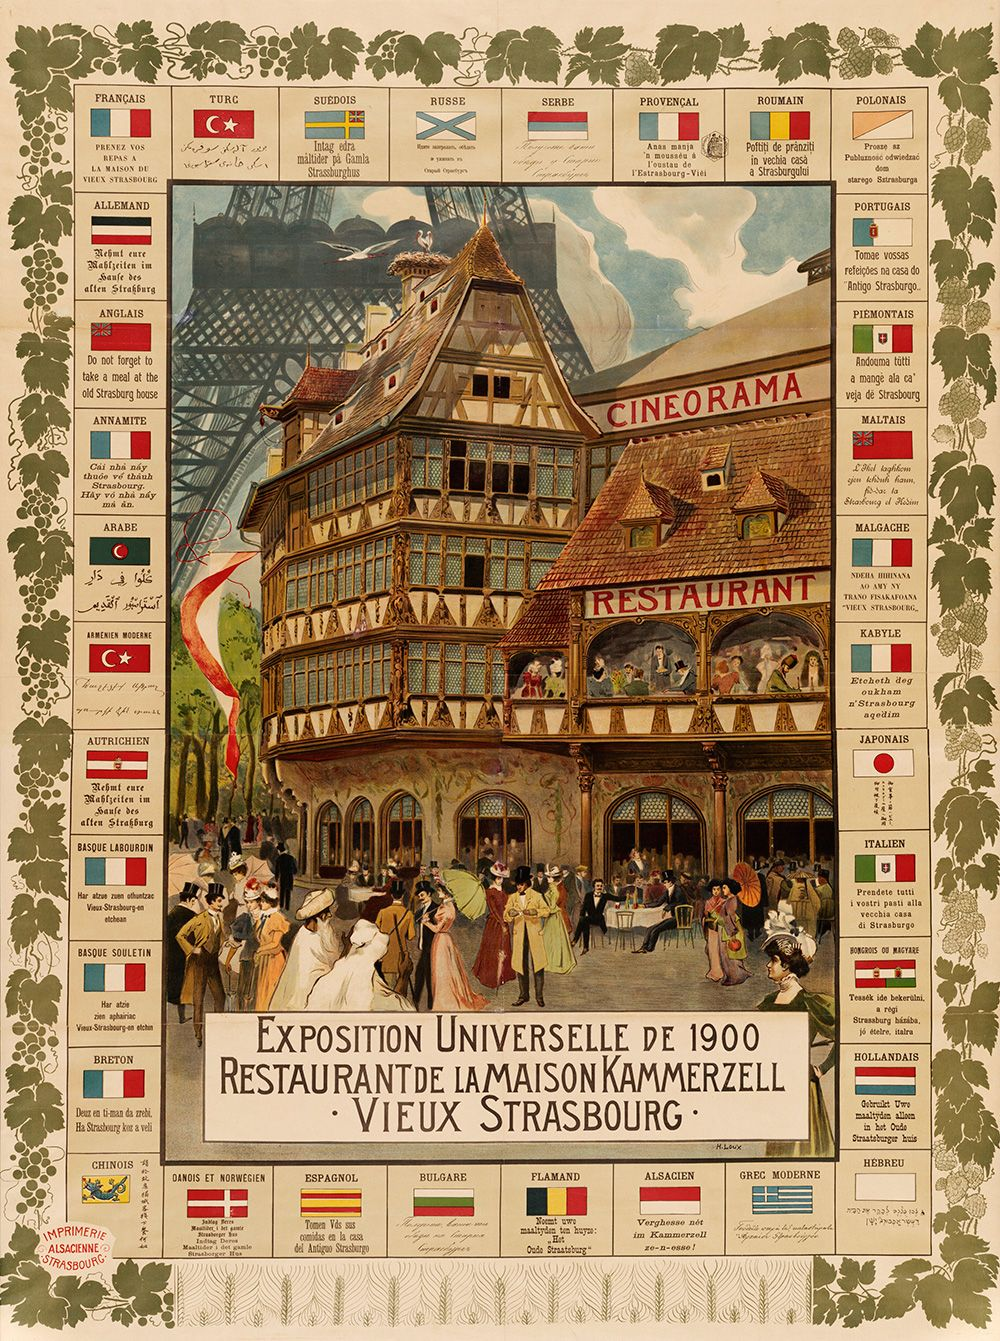 Exposition Universelle 1900 / Kammerzell Henri Loux